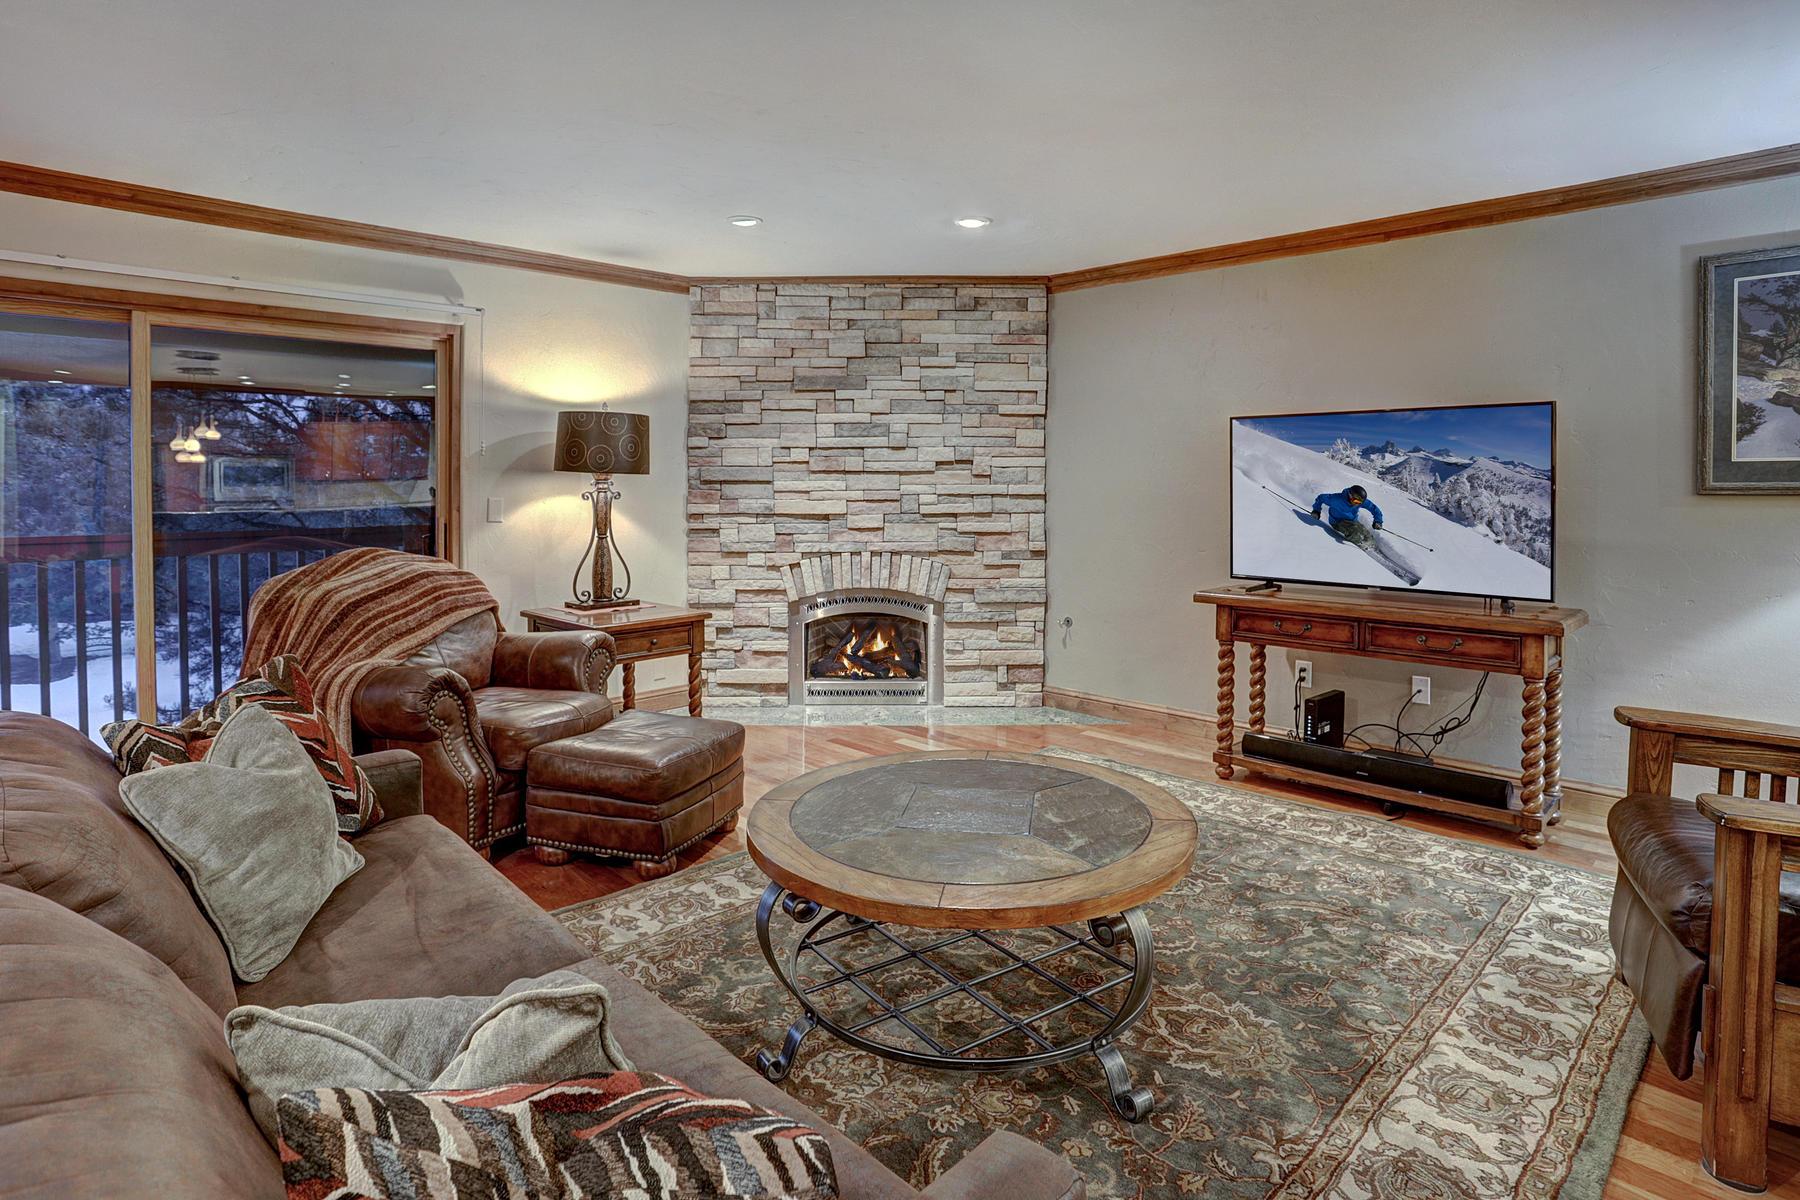 Condominiums のために 売買 アット Spacious Mountain Condo 734 Lagoon Drive #E Frisco, コロラド 80443 アメリカ